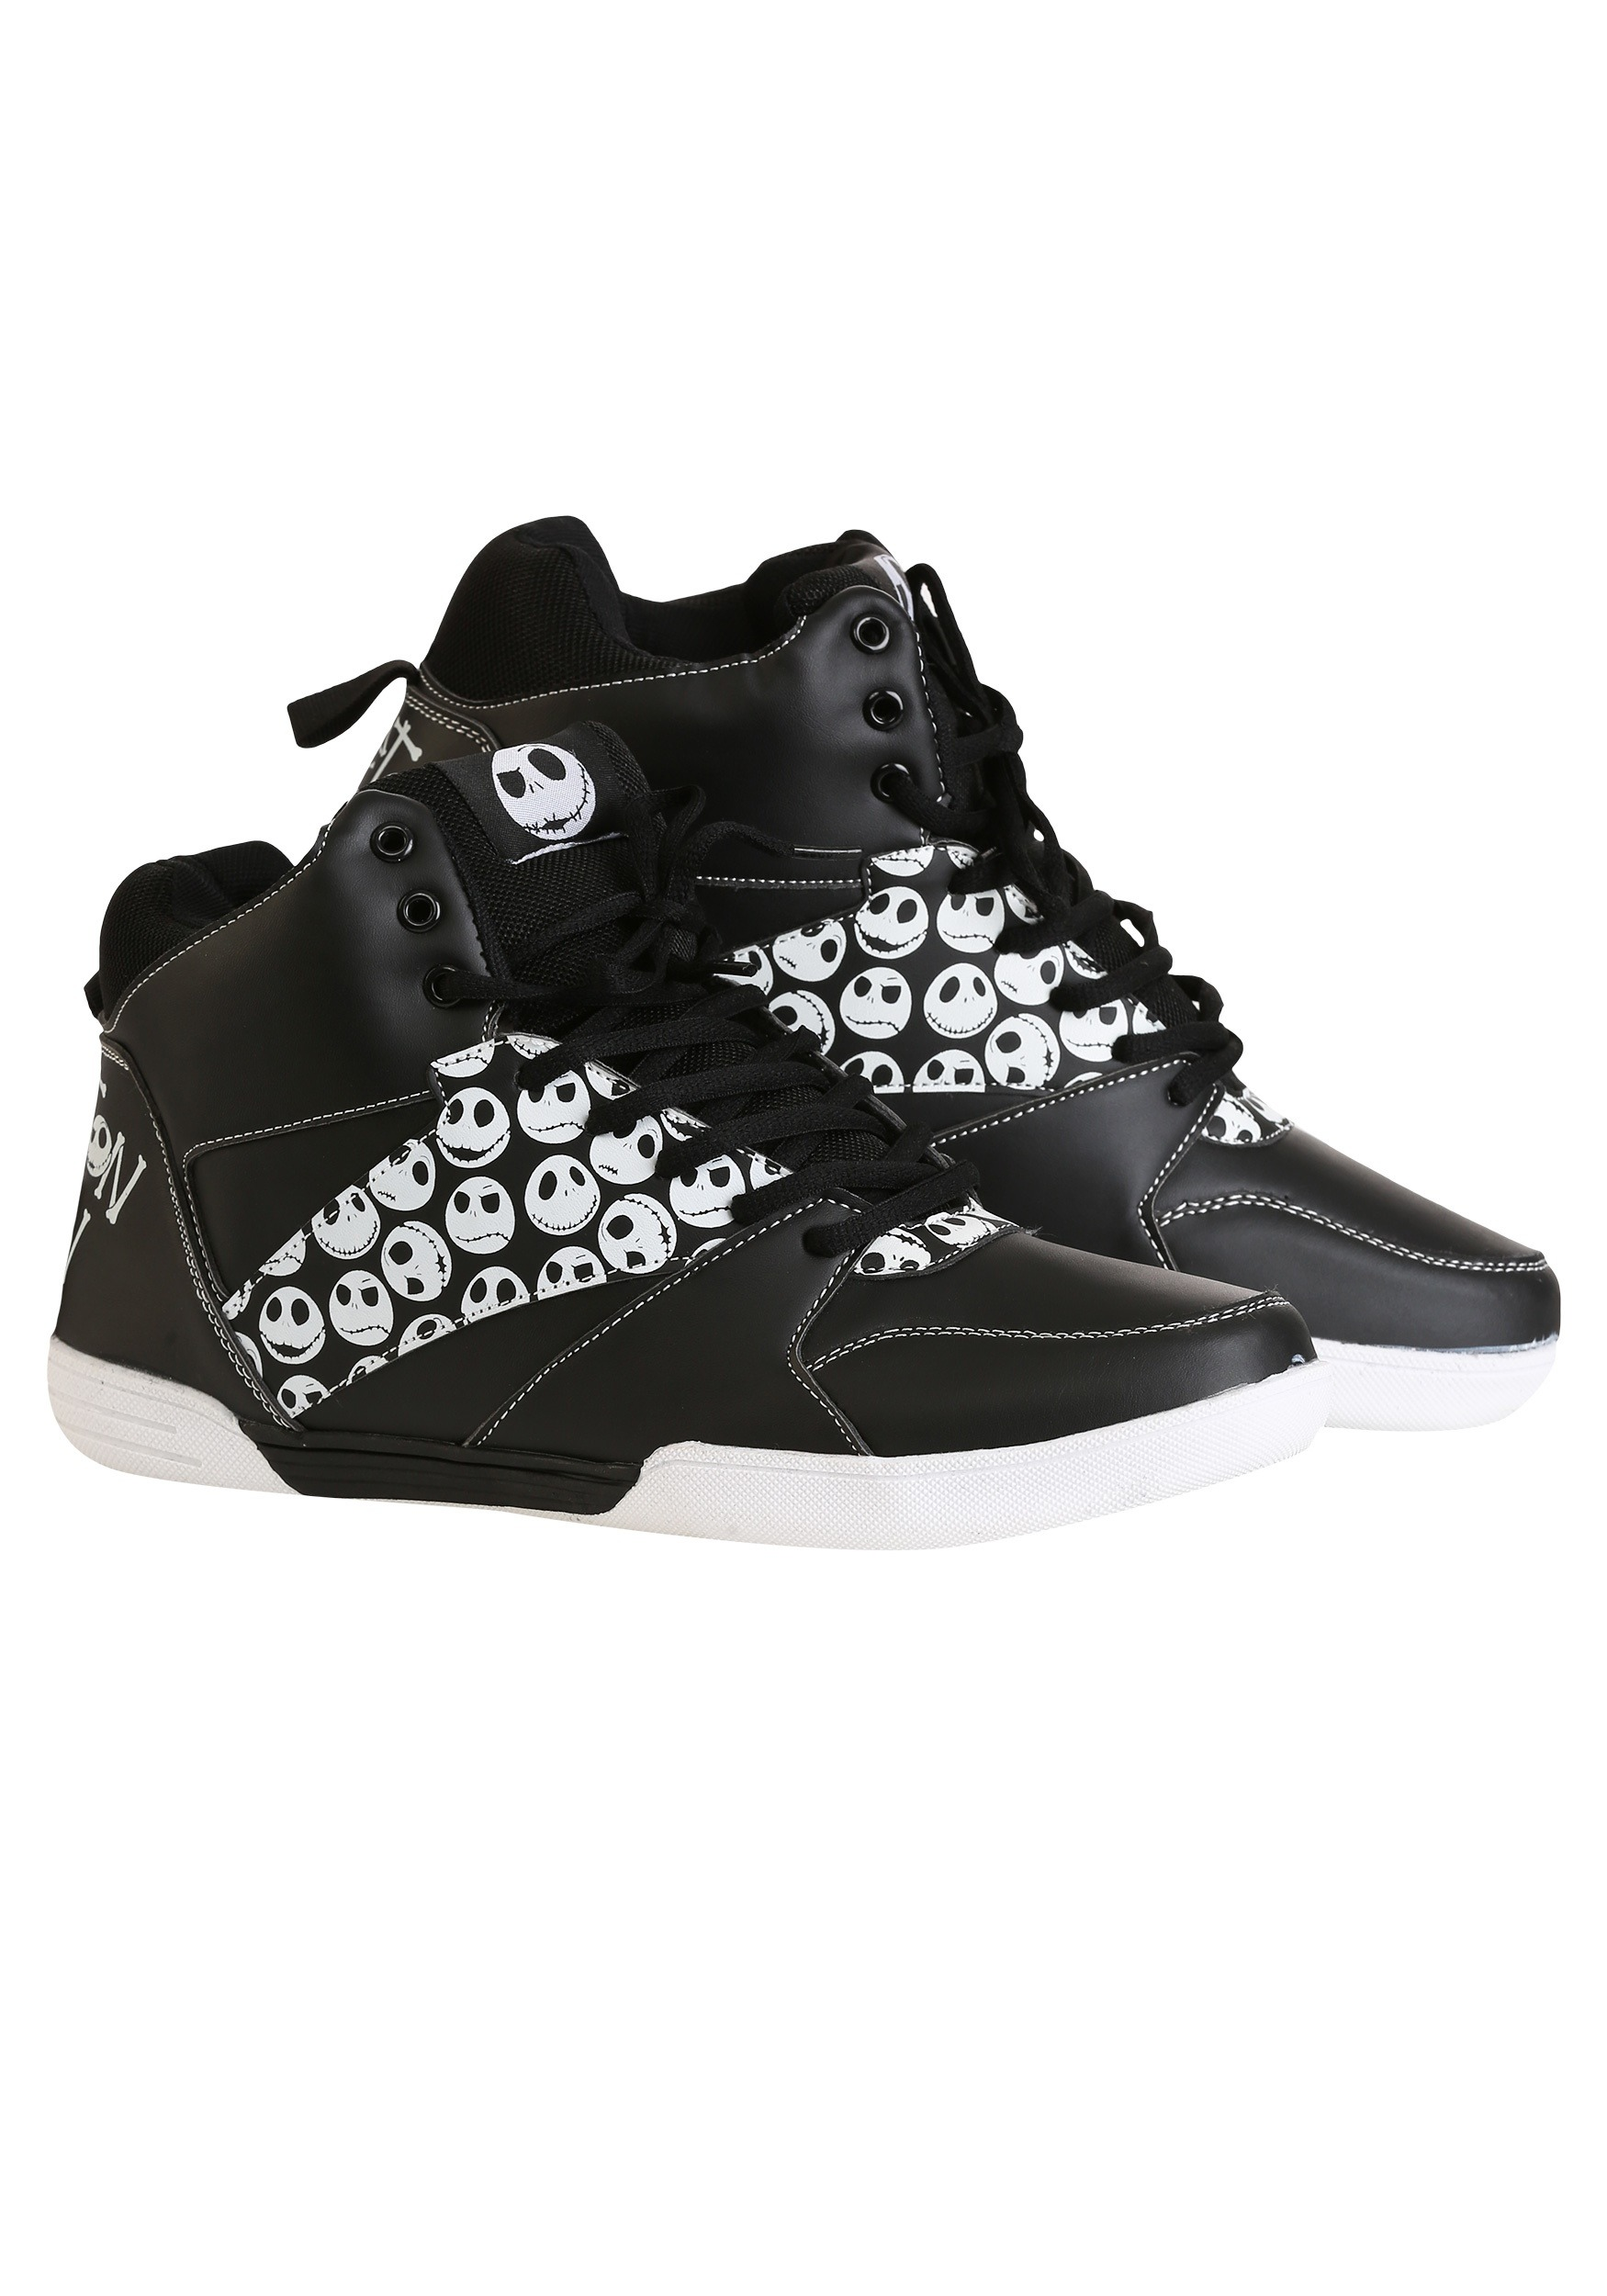 2dcbb5b66d23 Nightmare Before Christmas Jack Skellington High-Top Sneakers for Men